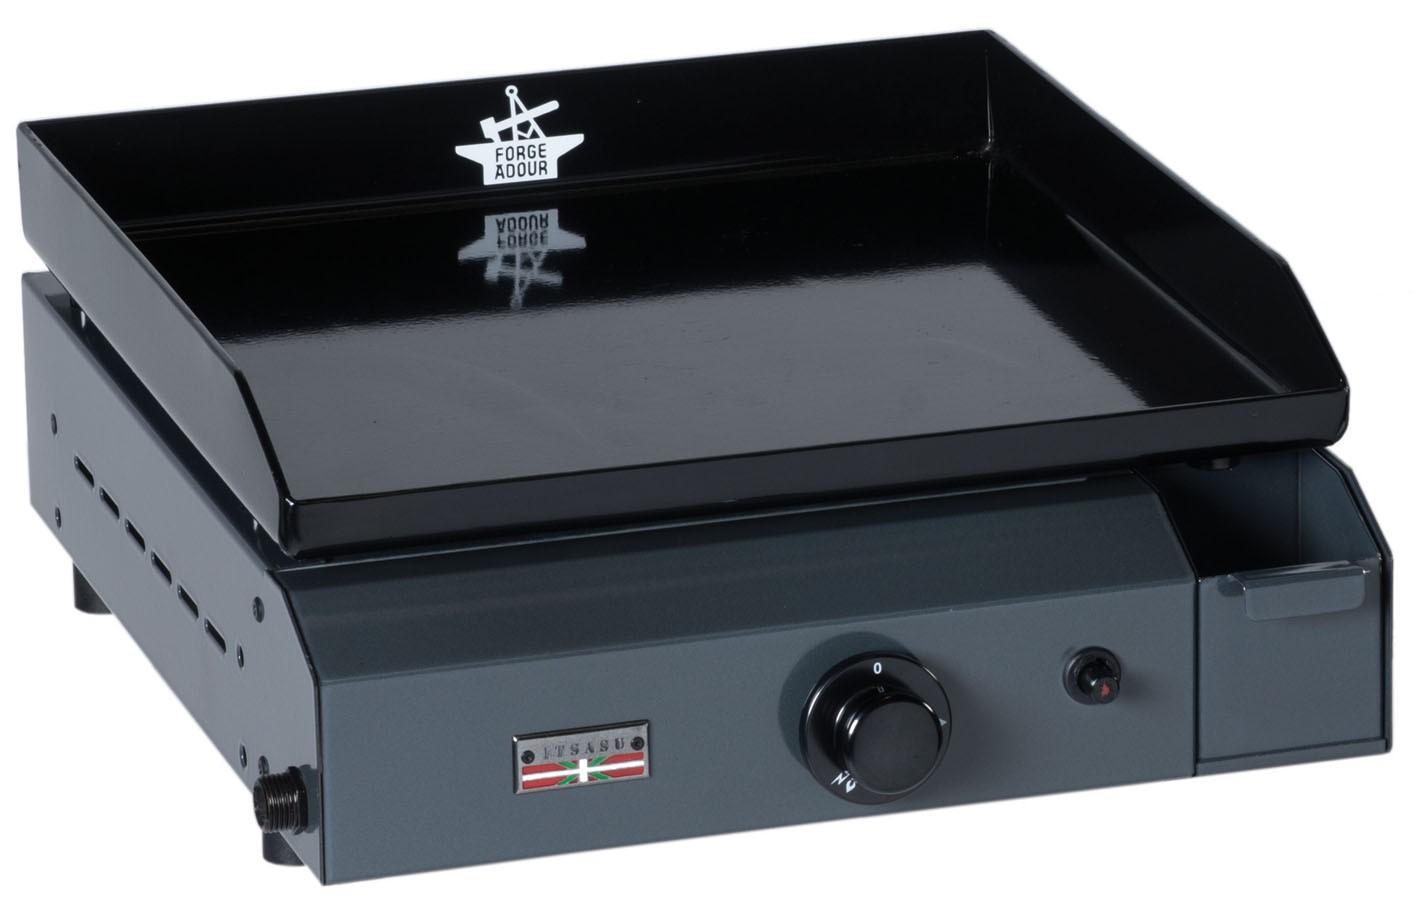 forge adour belharra steel 600 catgorie barbecue sur pied. Black Bedroom Furniture Sets. Home Design Ideas